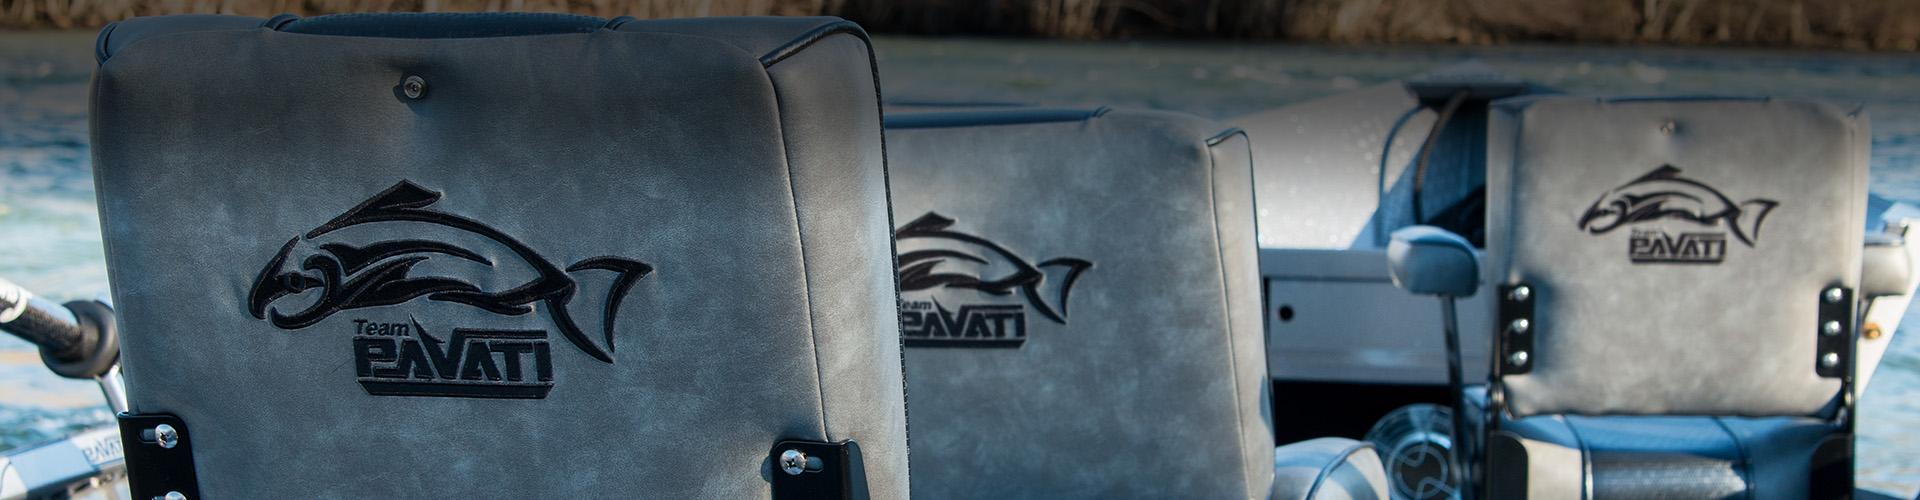 Pavati Drift Boat